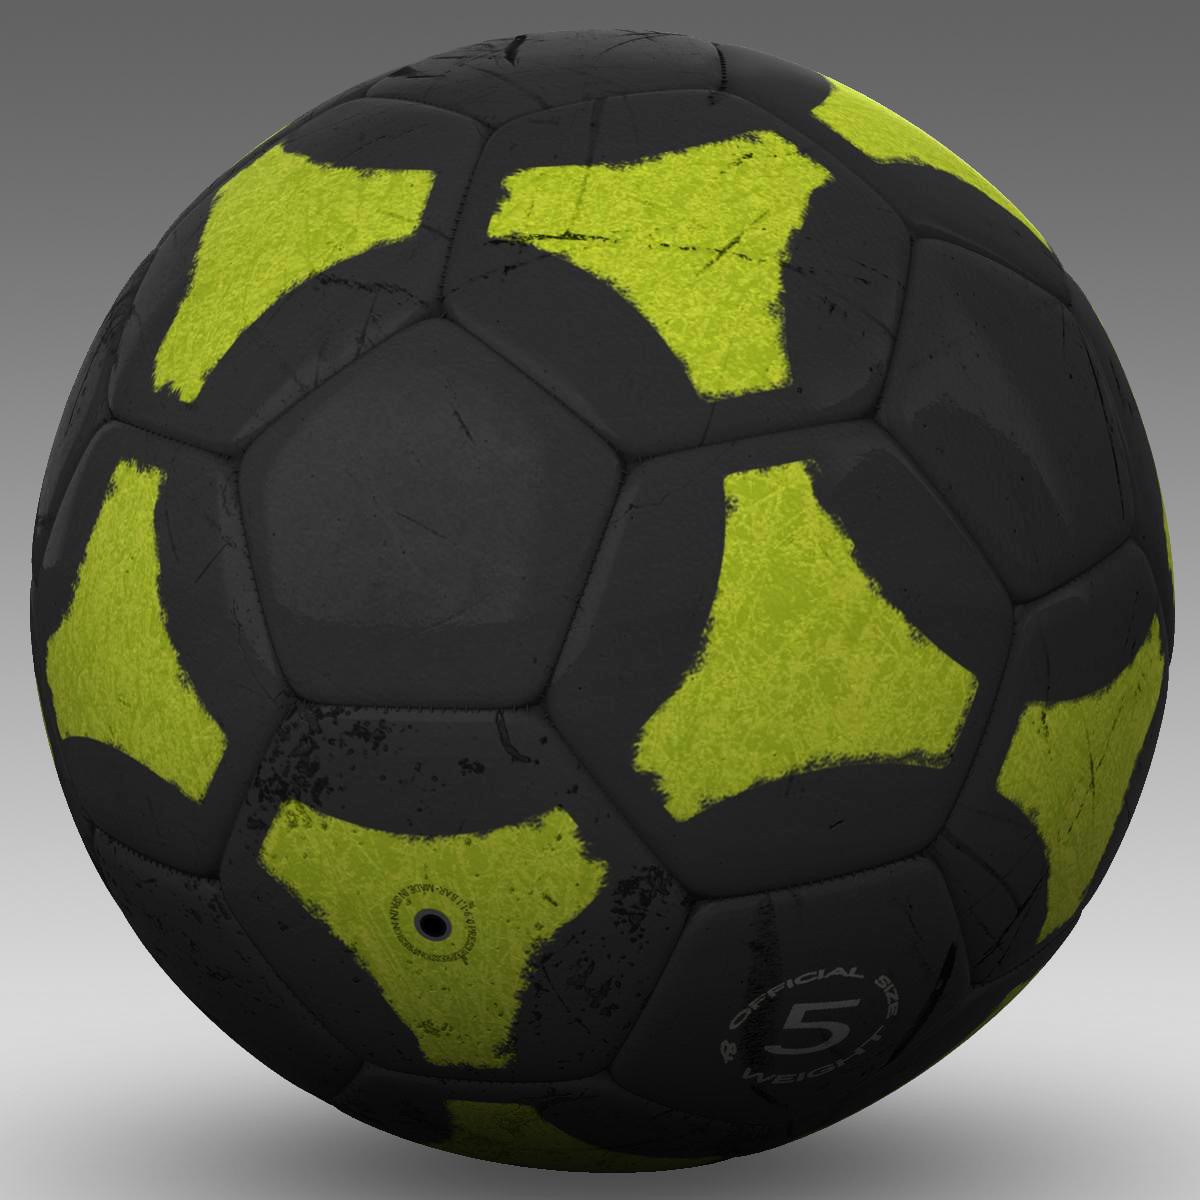 soccerball хар шар 3d загвар 3ds max fbx c4d ma mb obj 204211